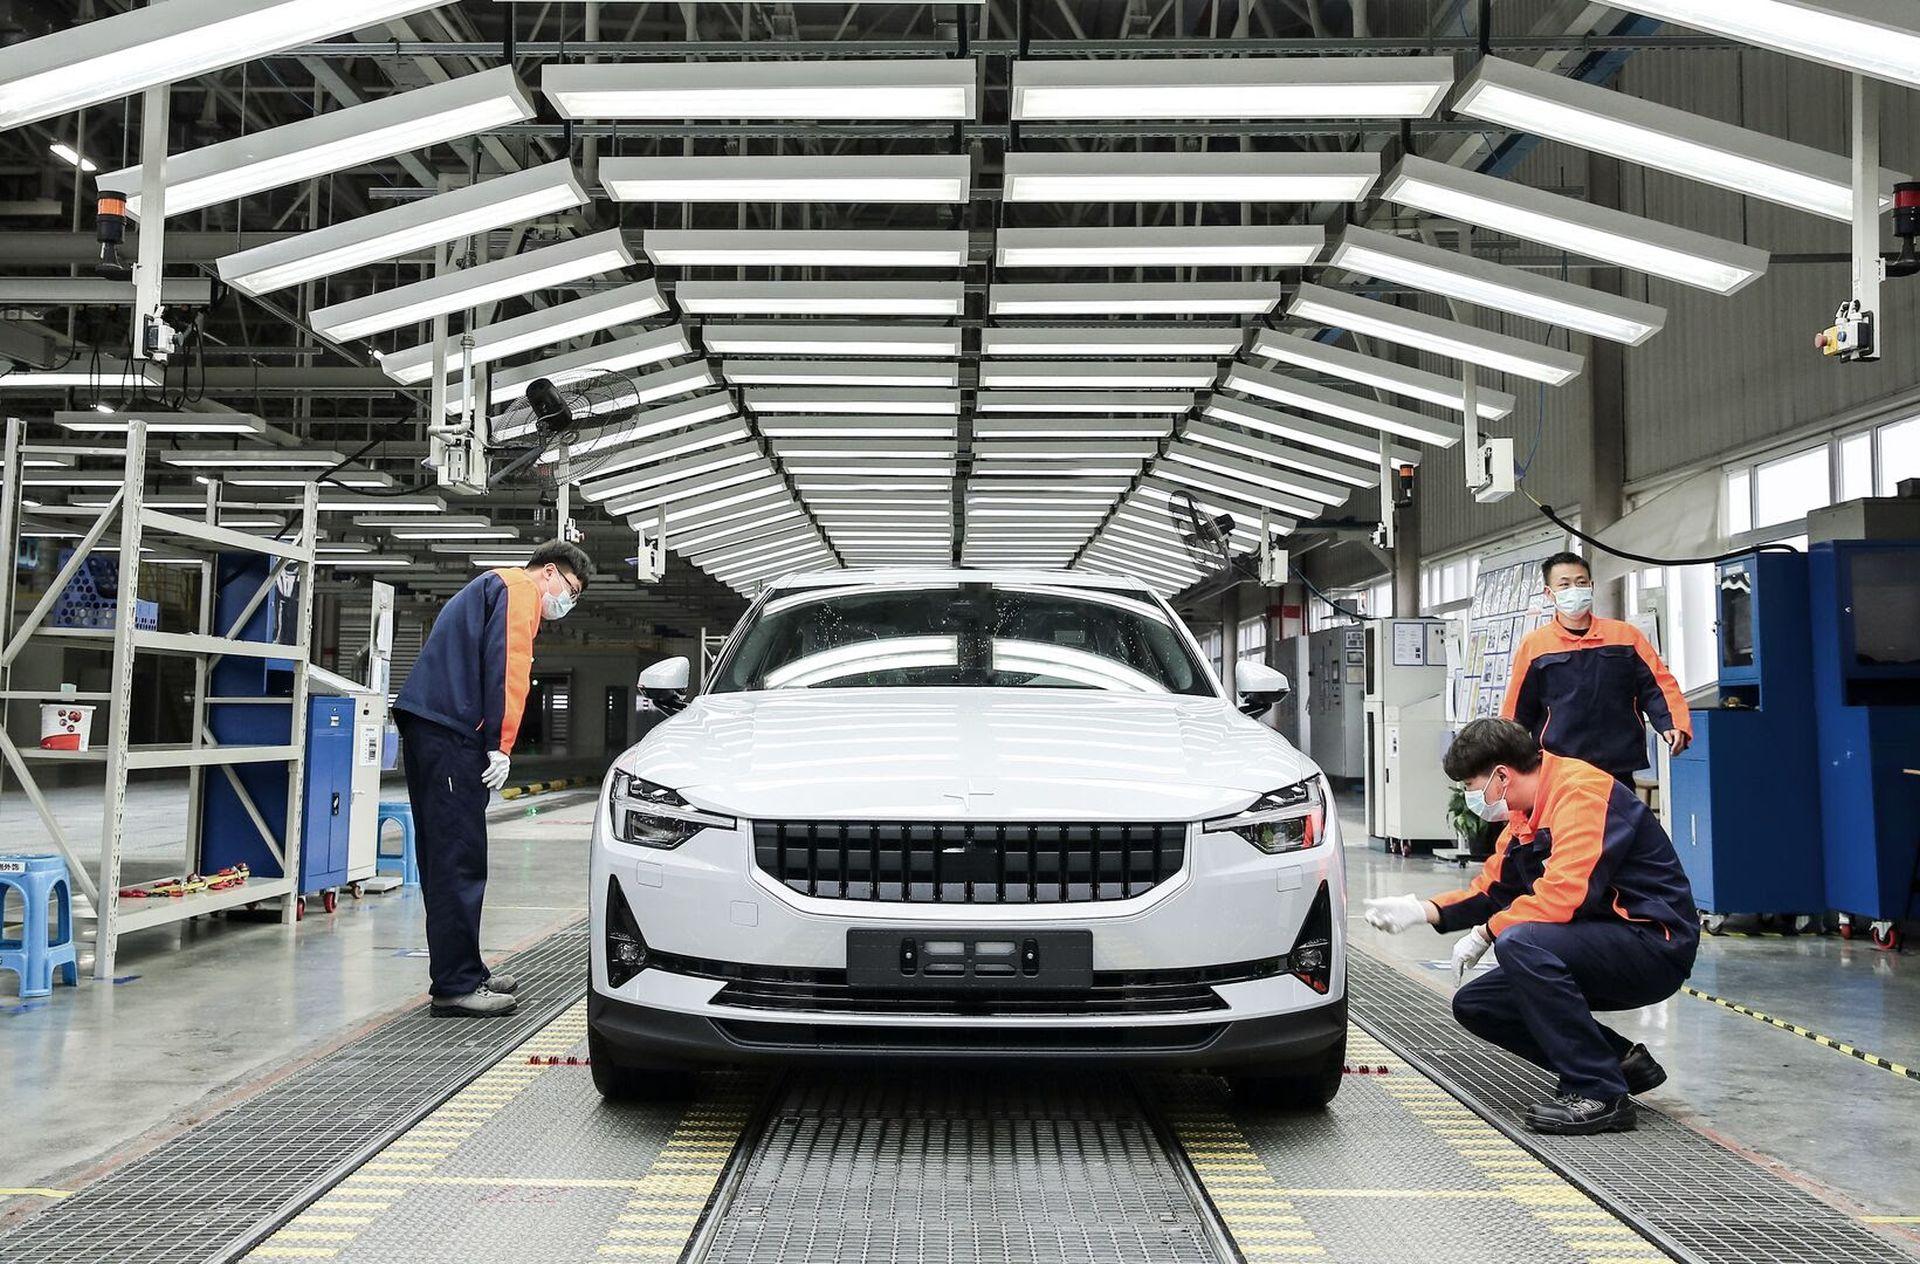 Polestar 2 - Serien-Produktion in Luqiao, China gestartet